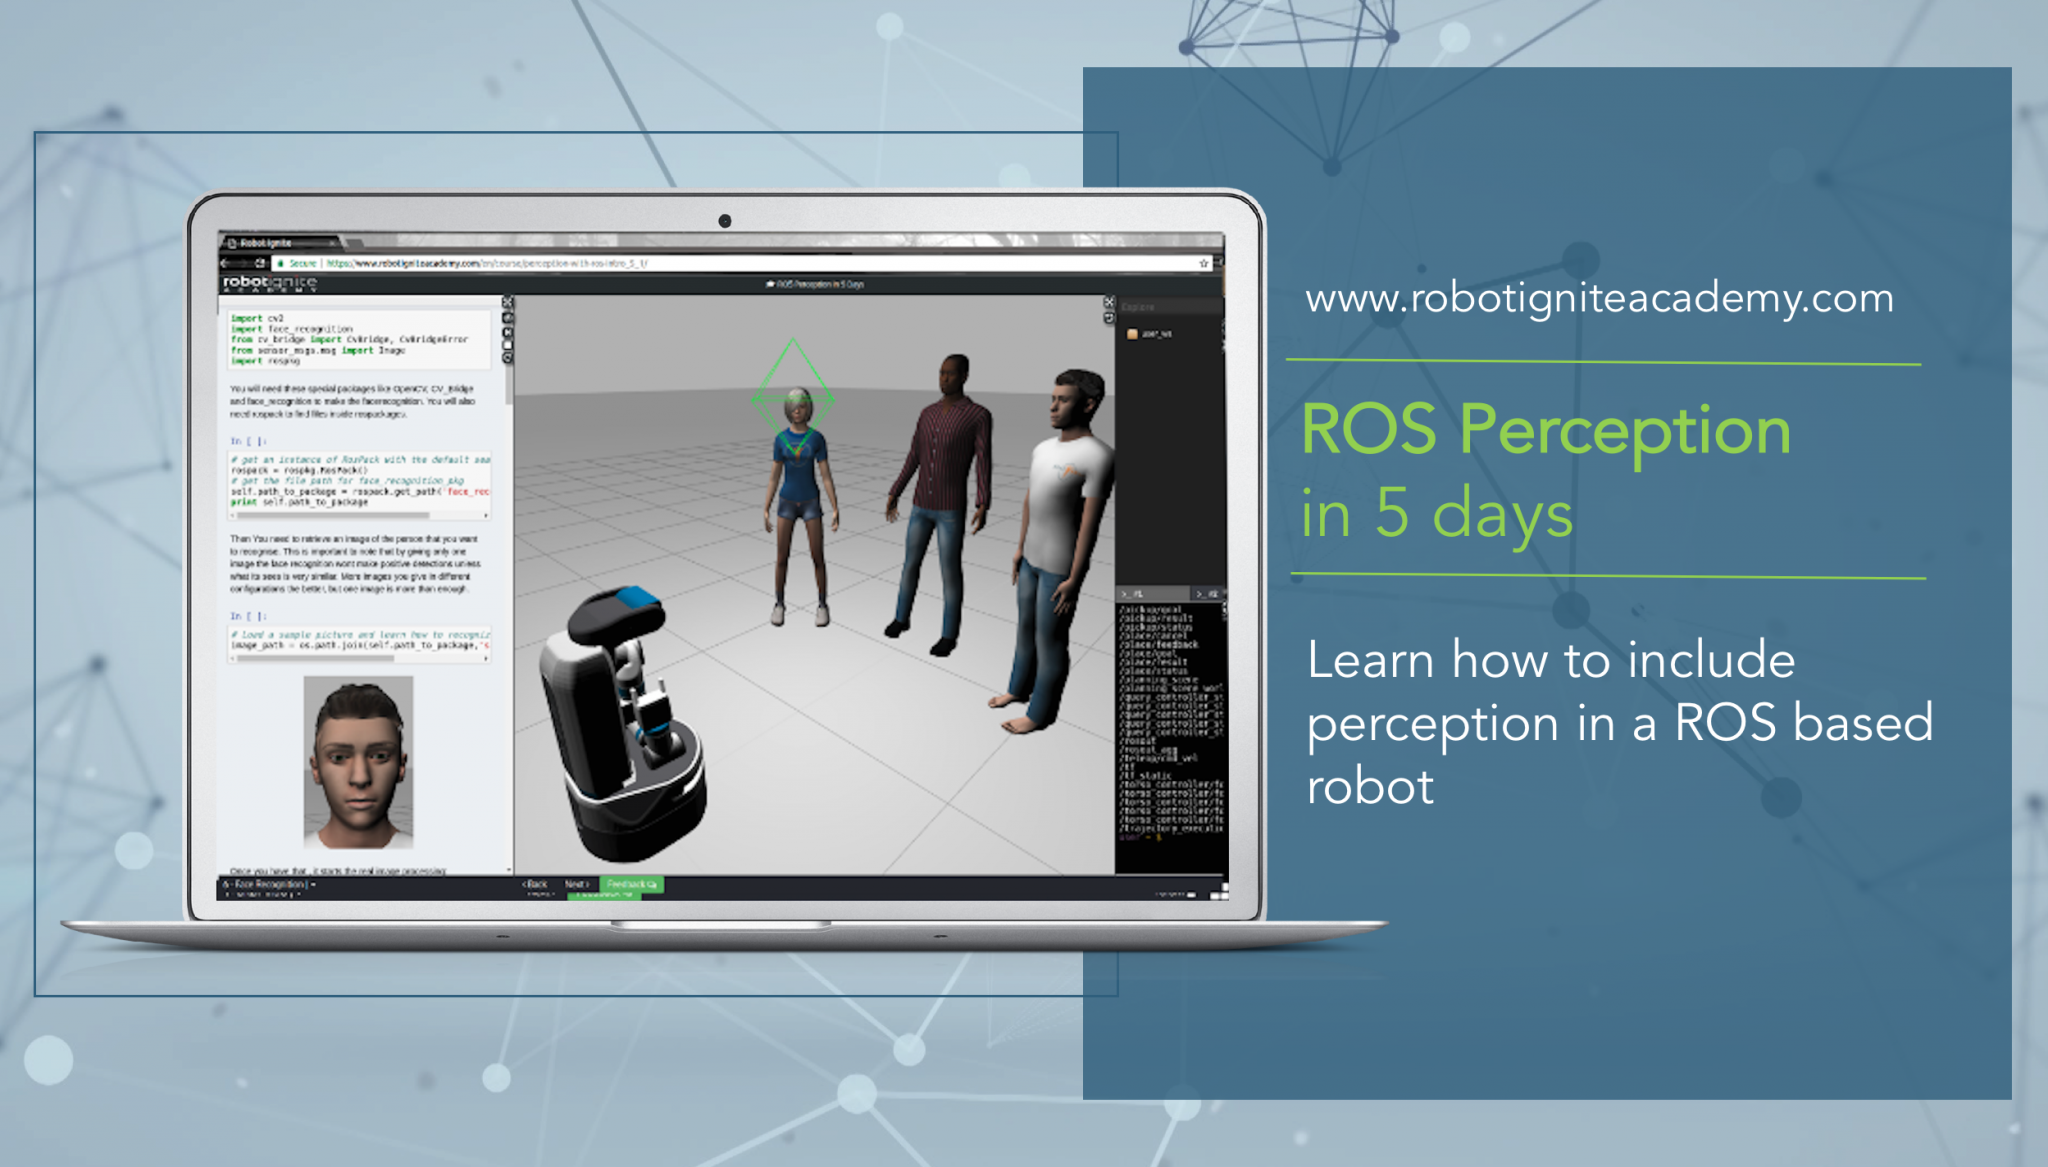 ROS Tutorials: ROS Perception in 5 Days | Robot Ignite Academy